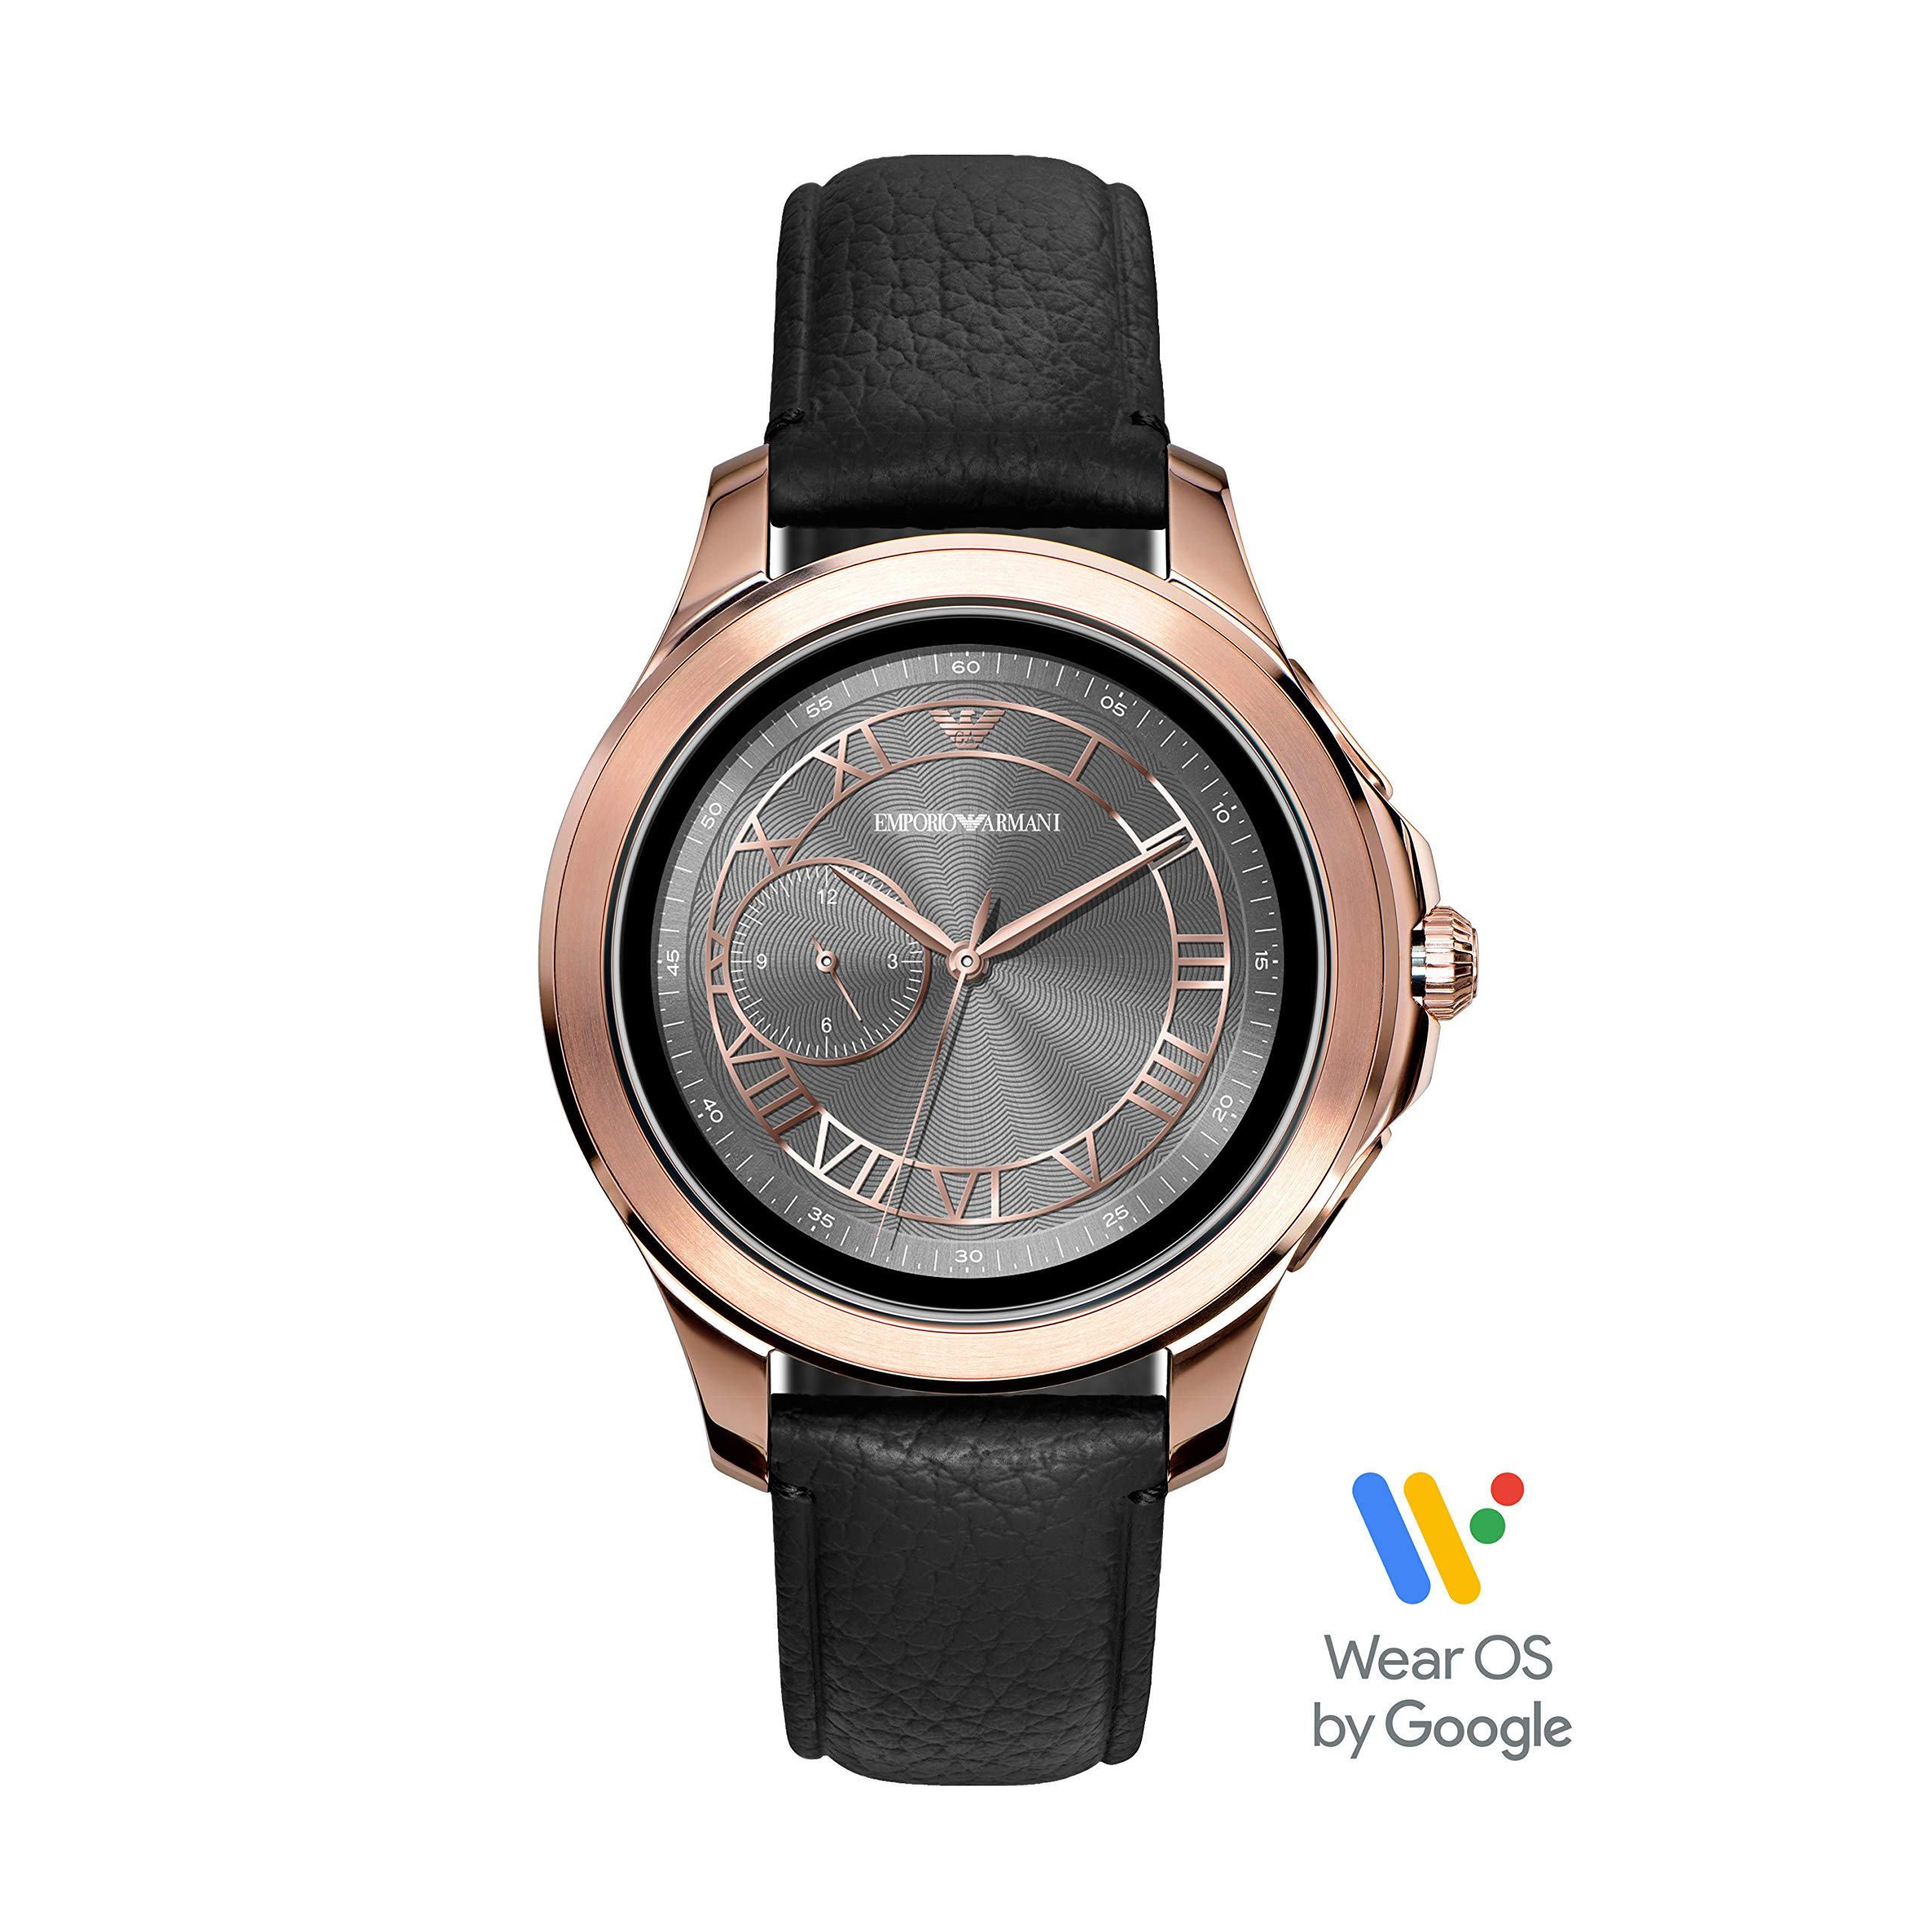 Emporio Armani Dress Watch (Model: ART5012)